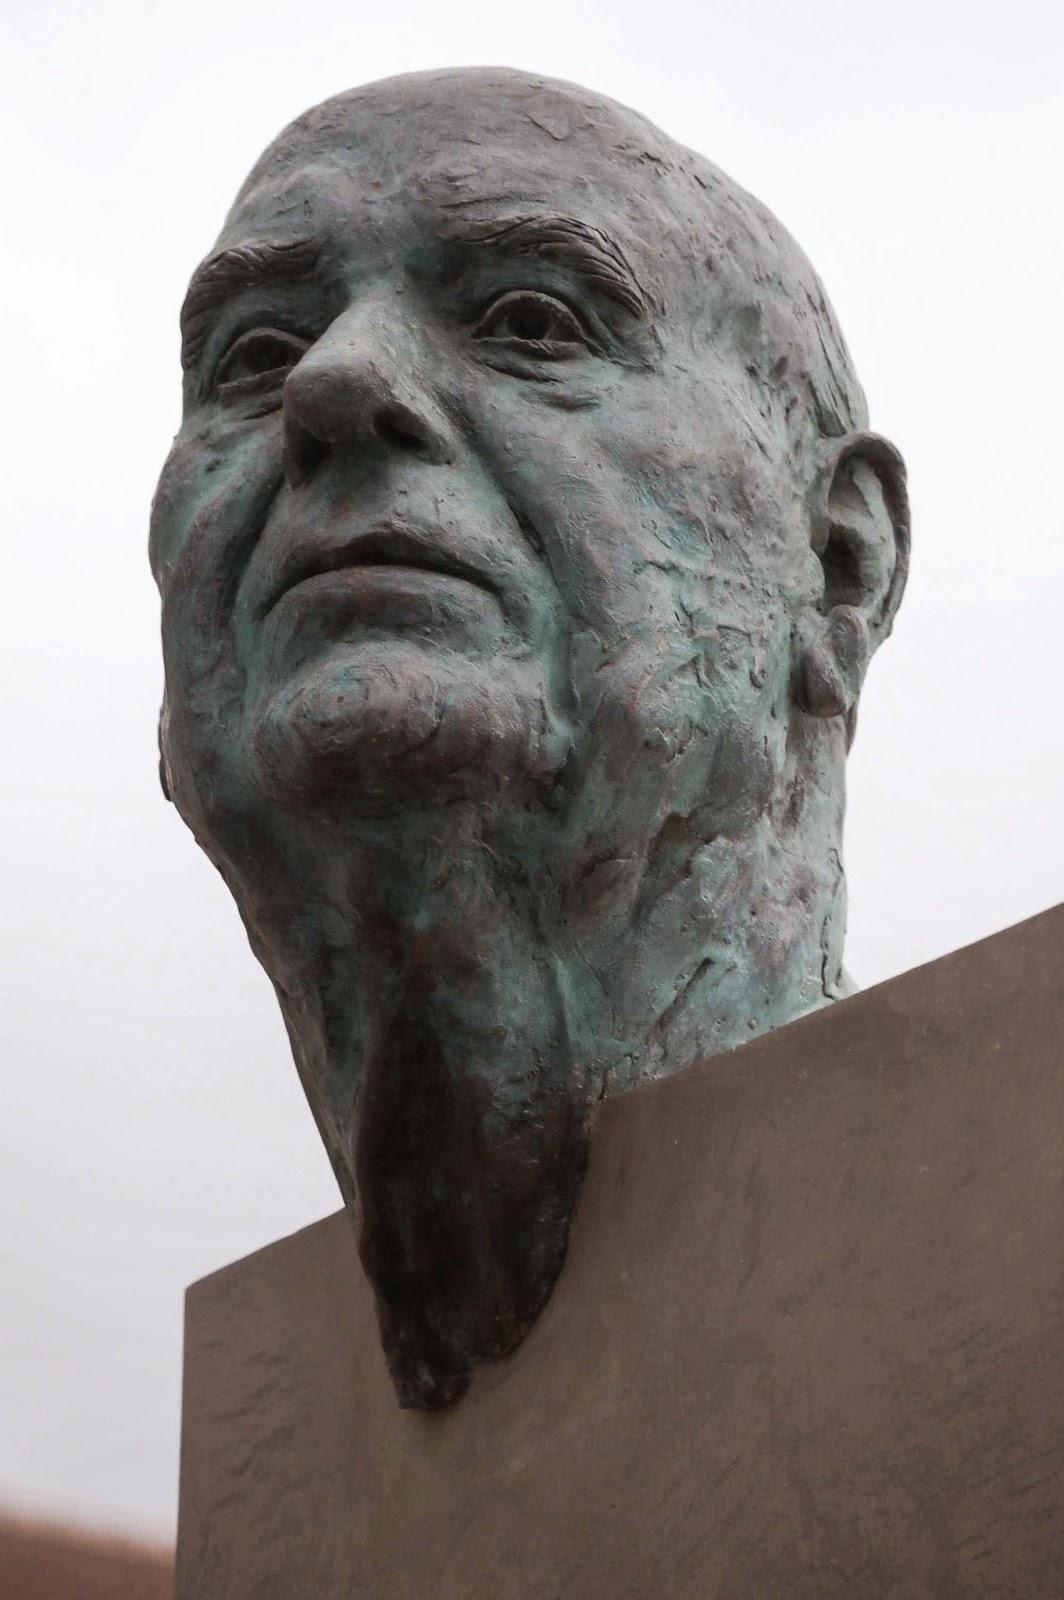 Monumento bronce Fuente Álamo Murcia Arturo Serra escultura 2